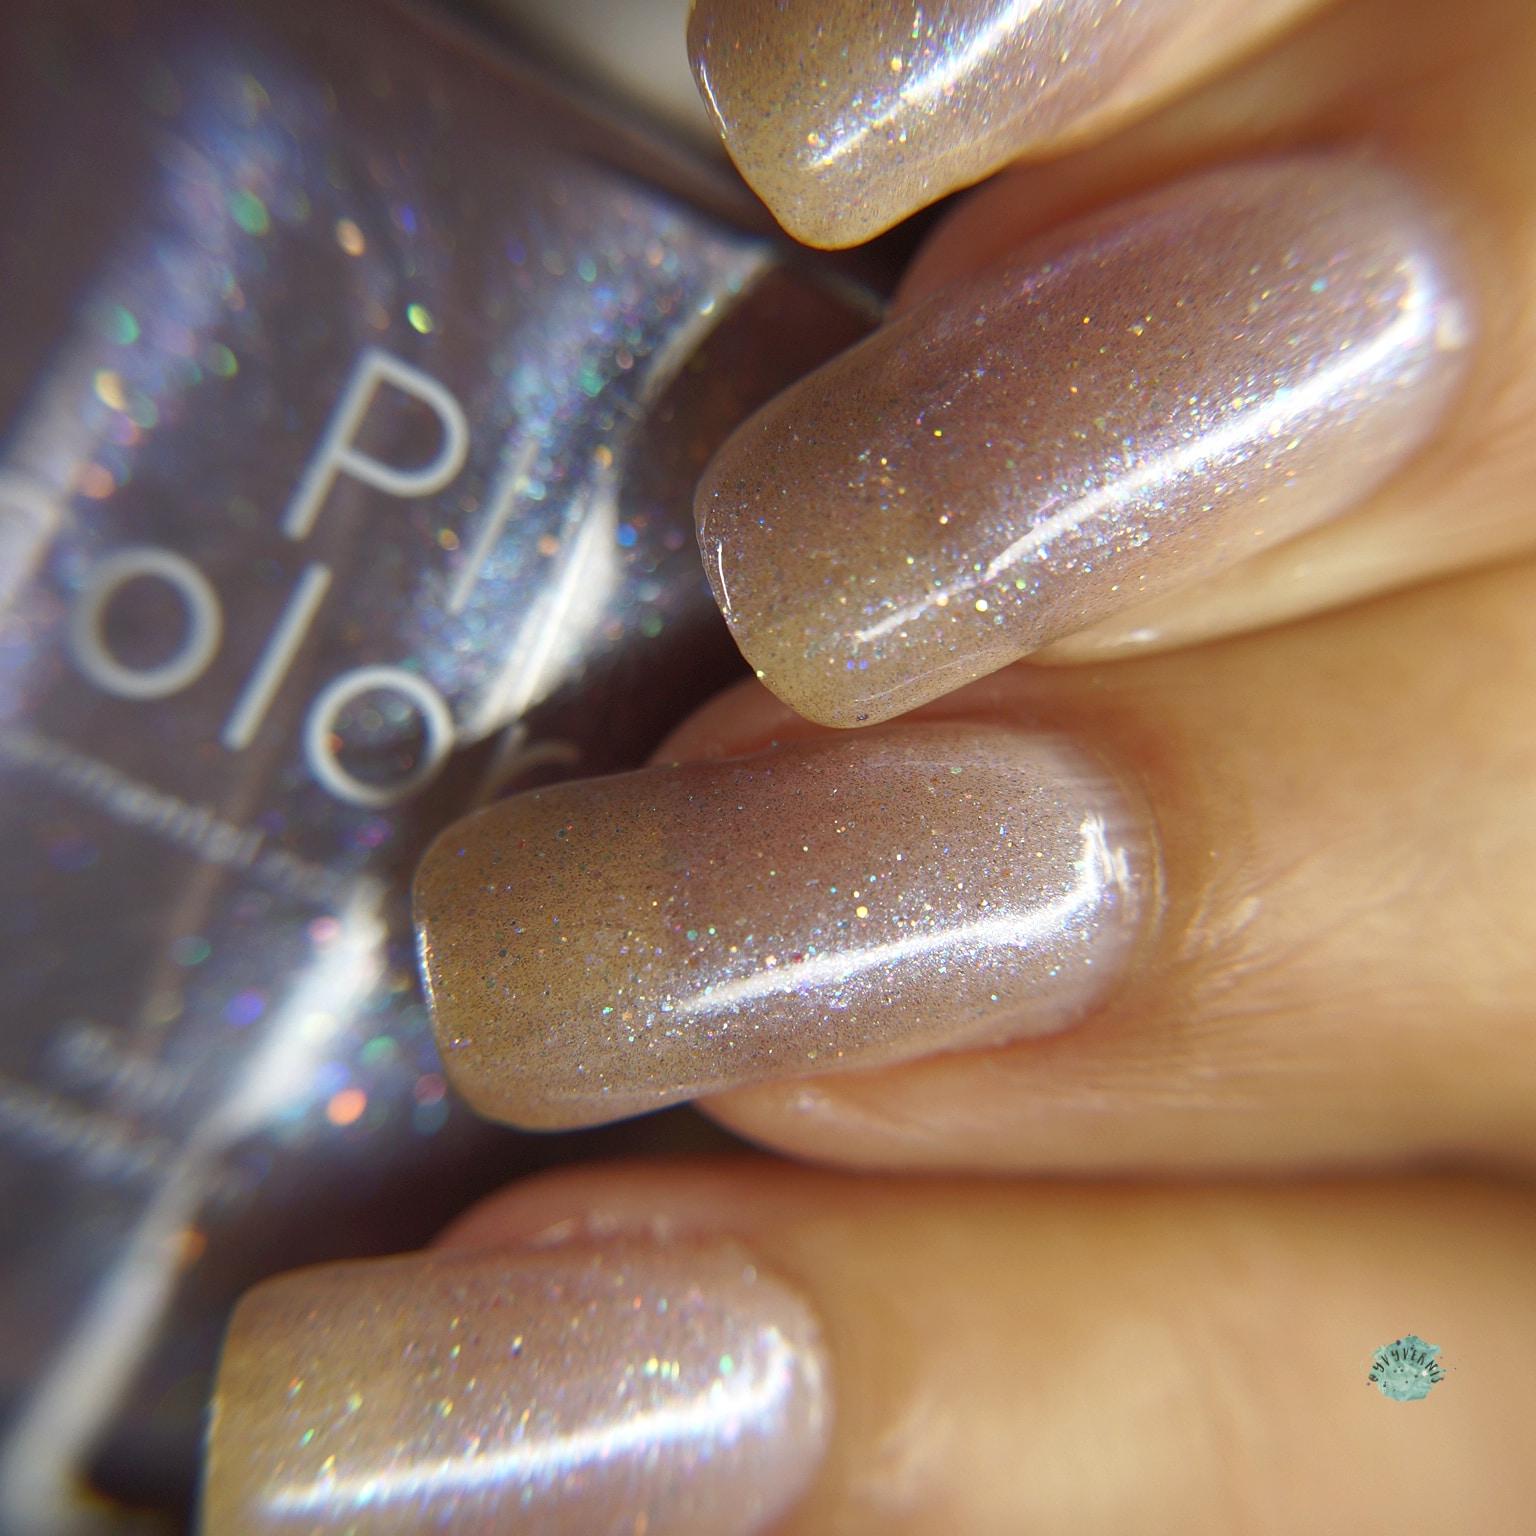 Snow Cherries From France.101 | PI Colors | Nail polish